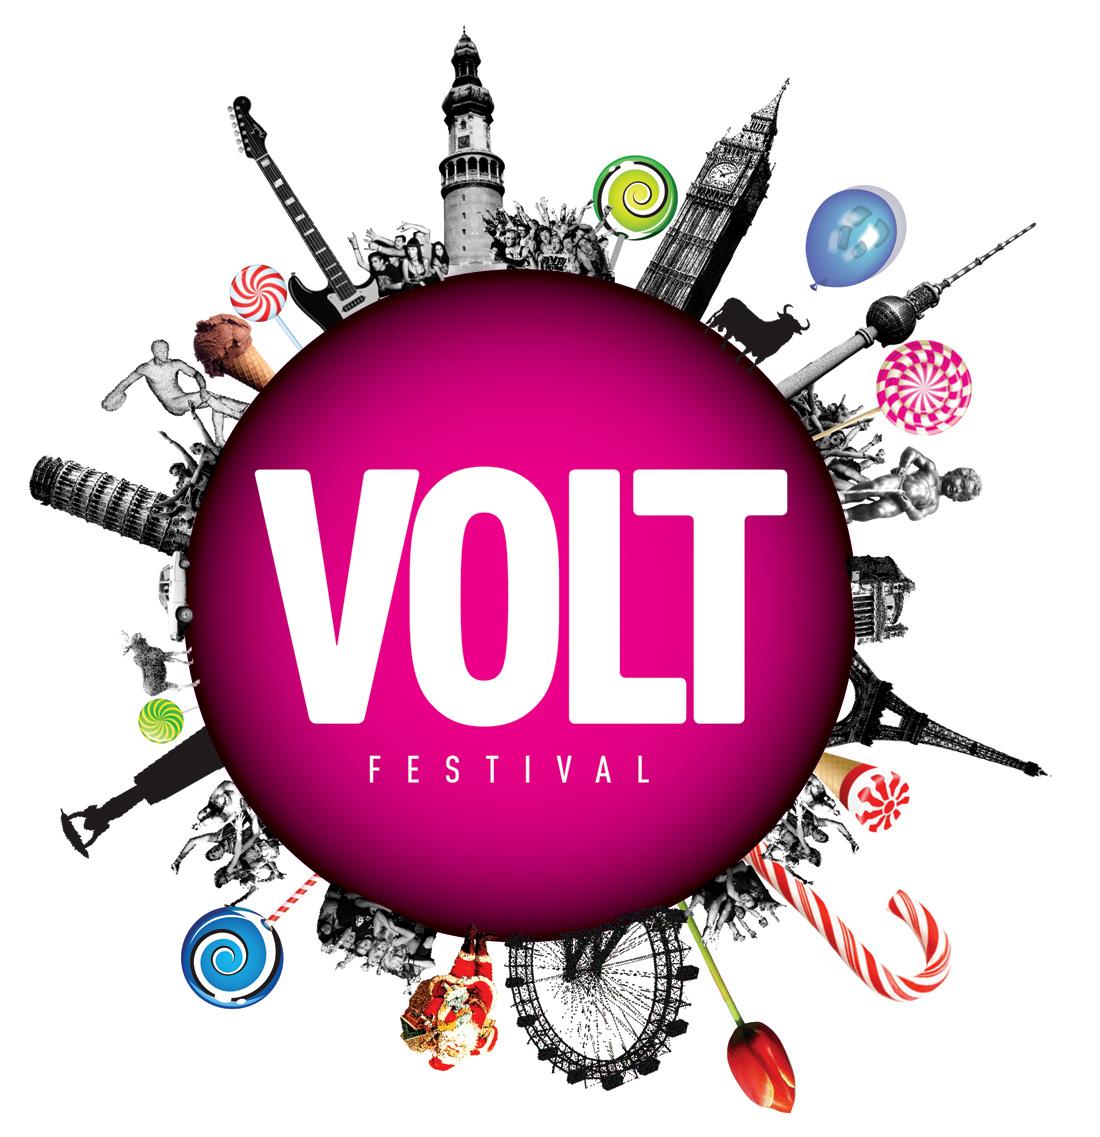 soproni-volt-fesztival-2011-3-o